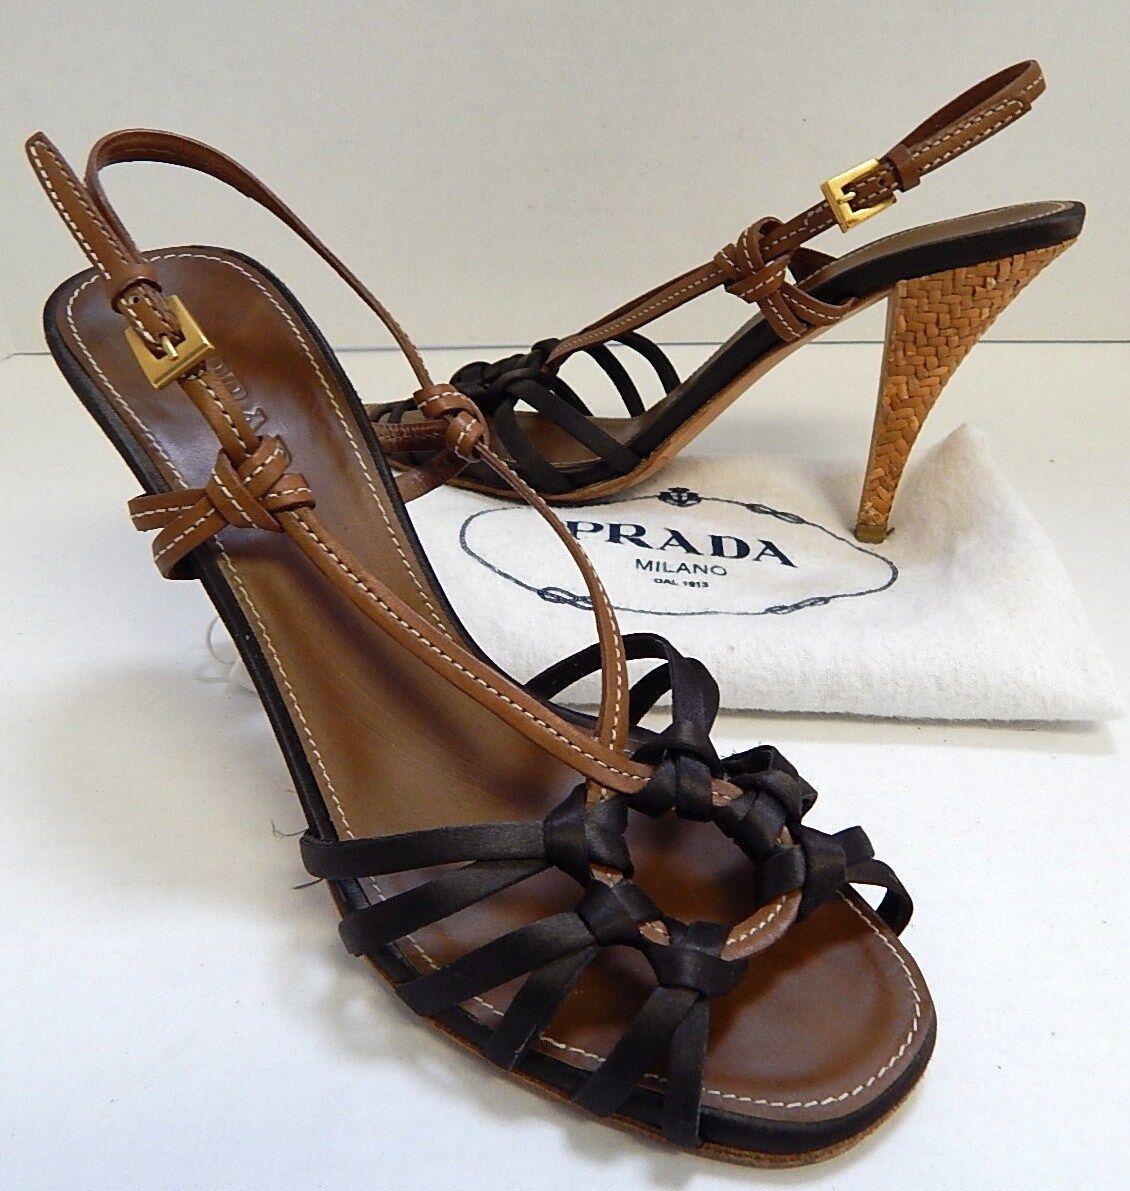 Prada 36.5 6M Braun Leder Satin Strappy Slingback Heels